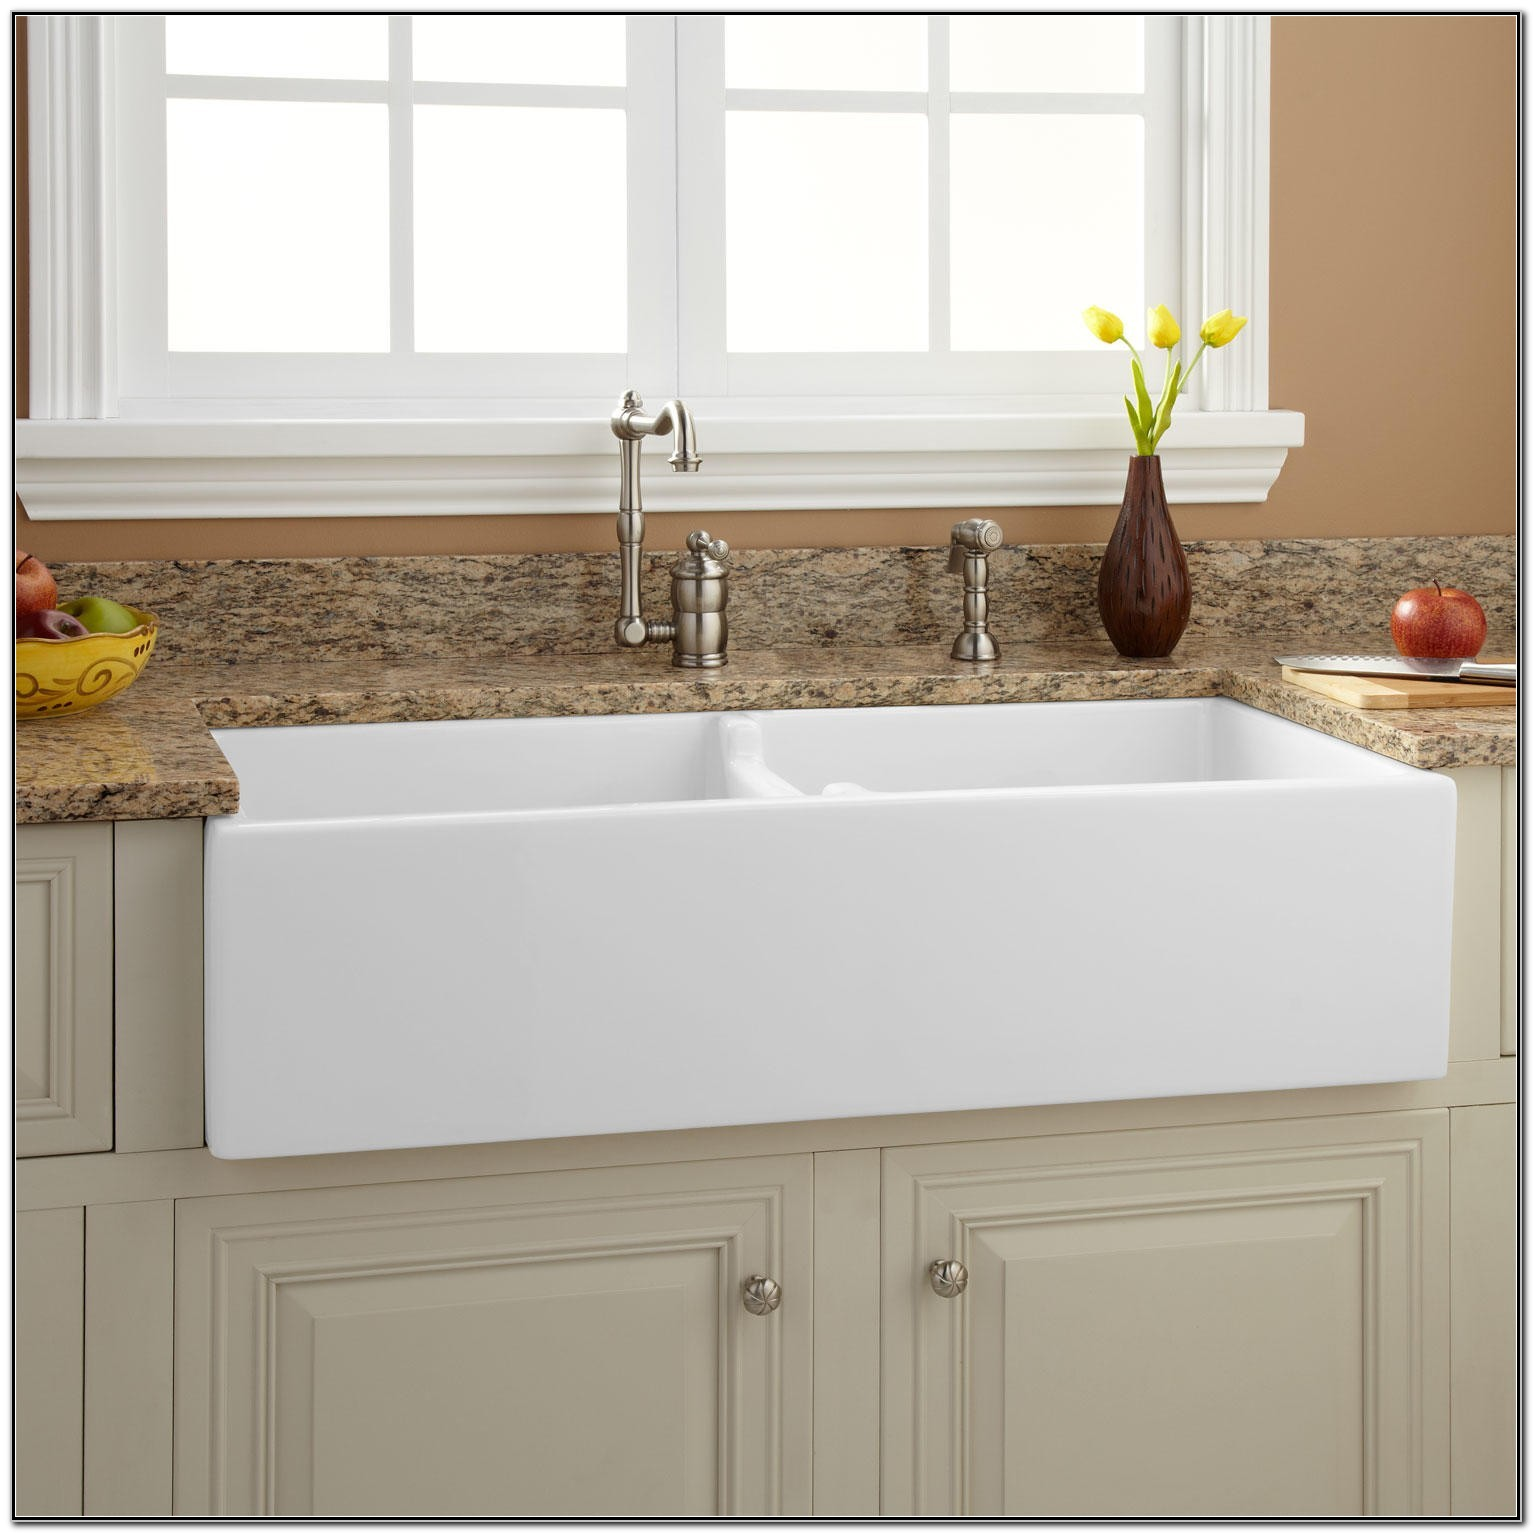 White Apron Front Kitchen Sink Double Bowl